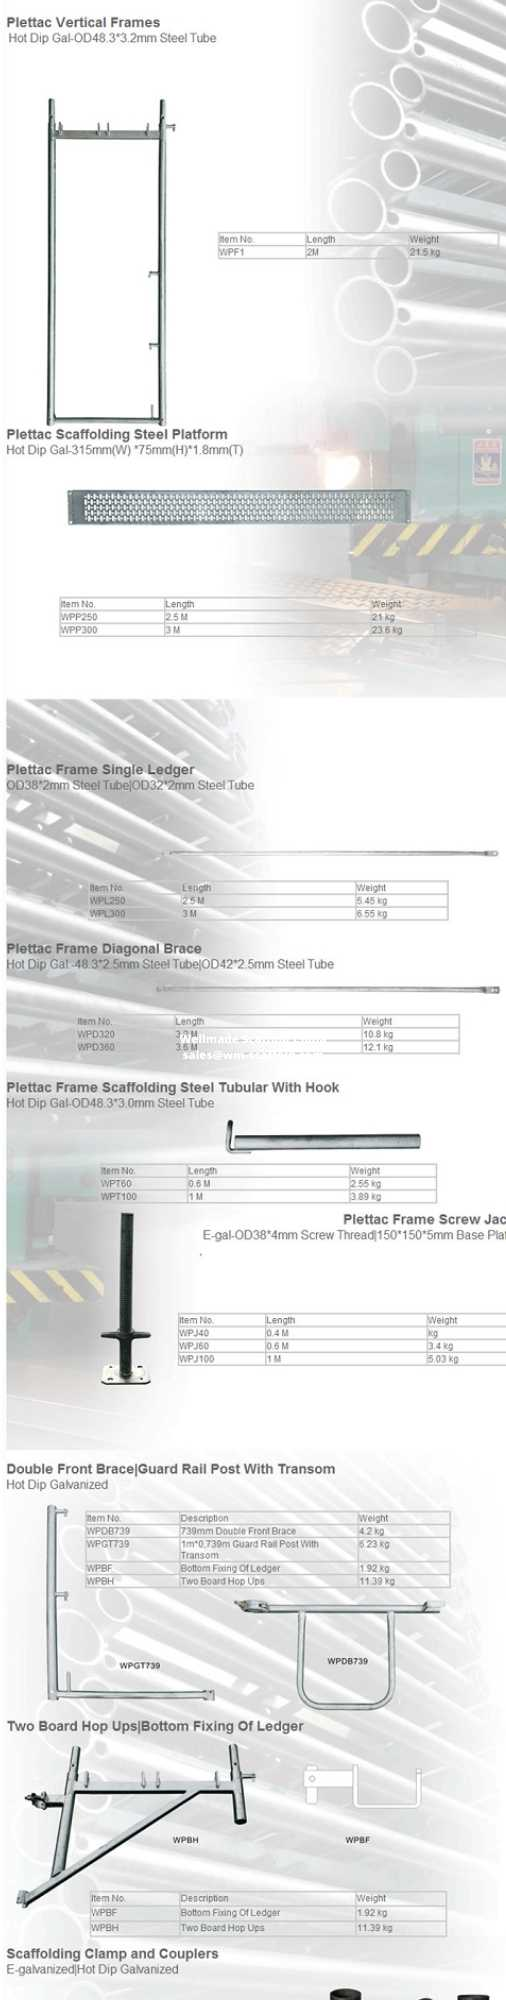 plettac scaffolding frame -altrad scaffolding germany-euro scaffolding parts list